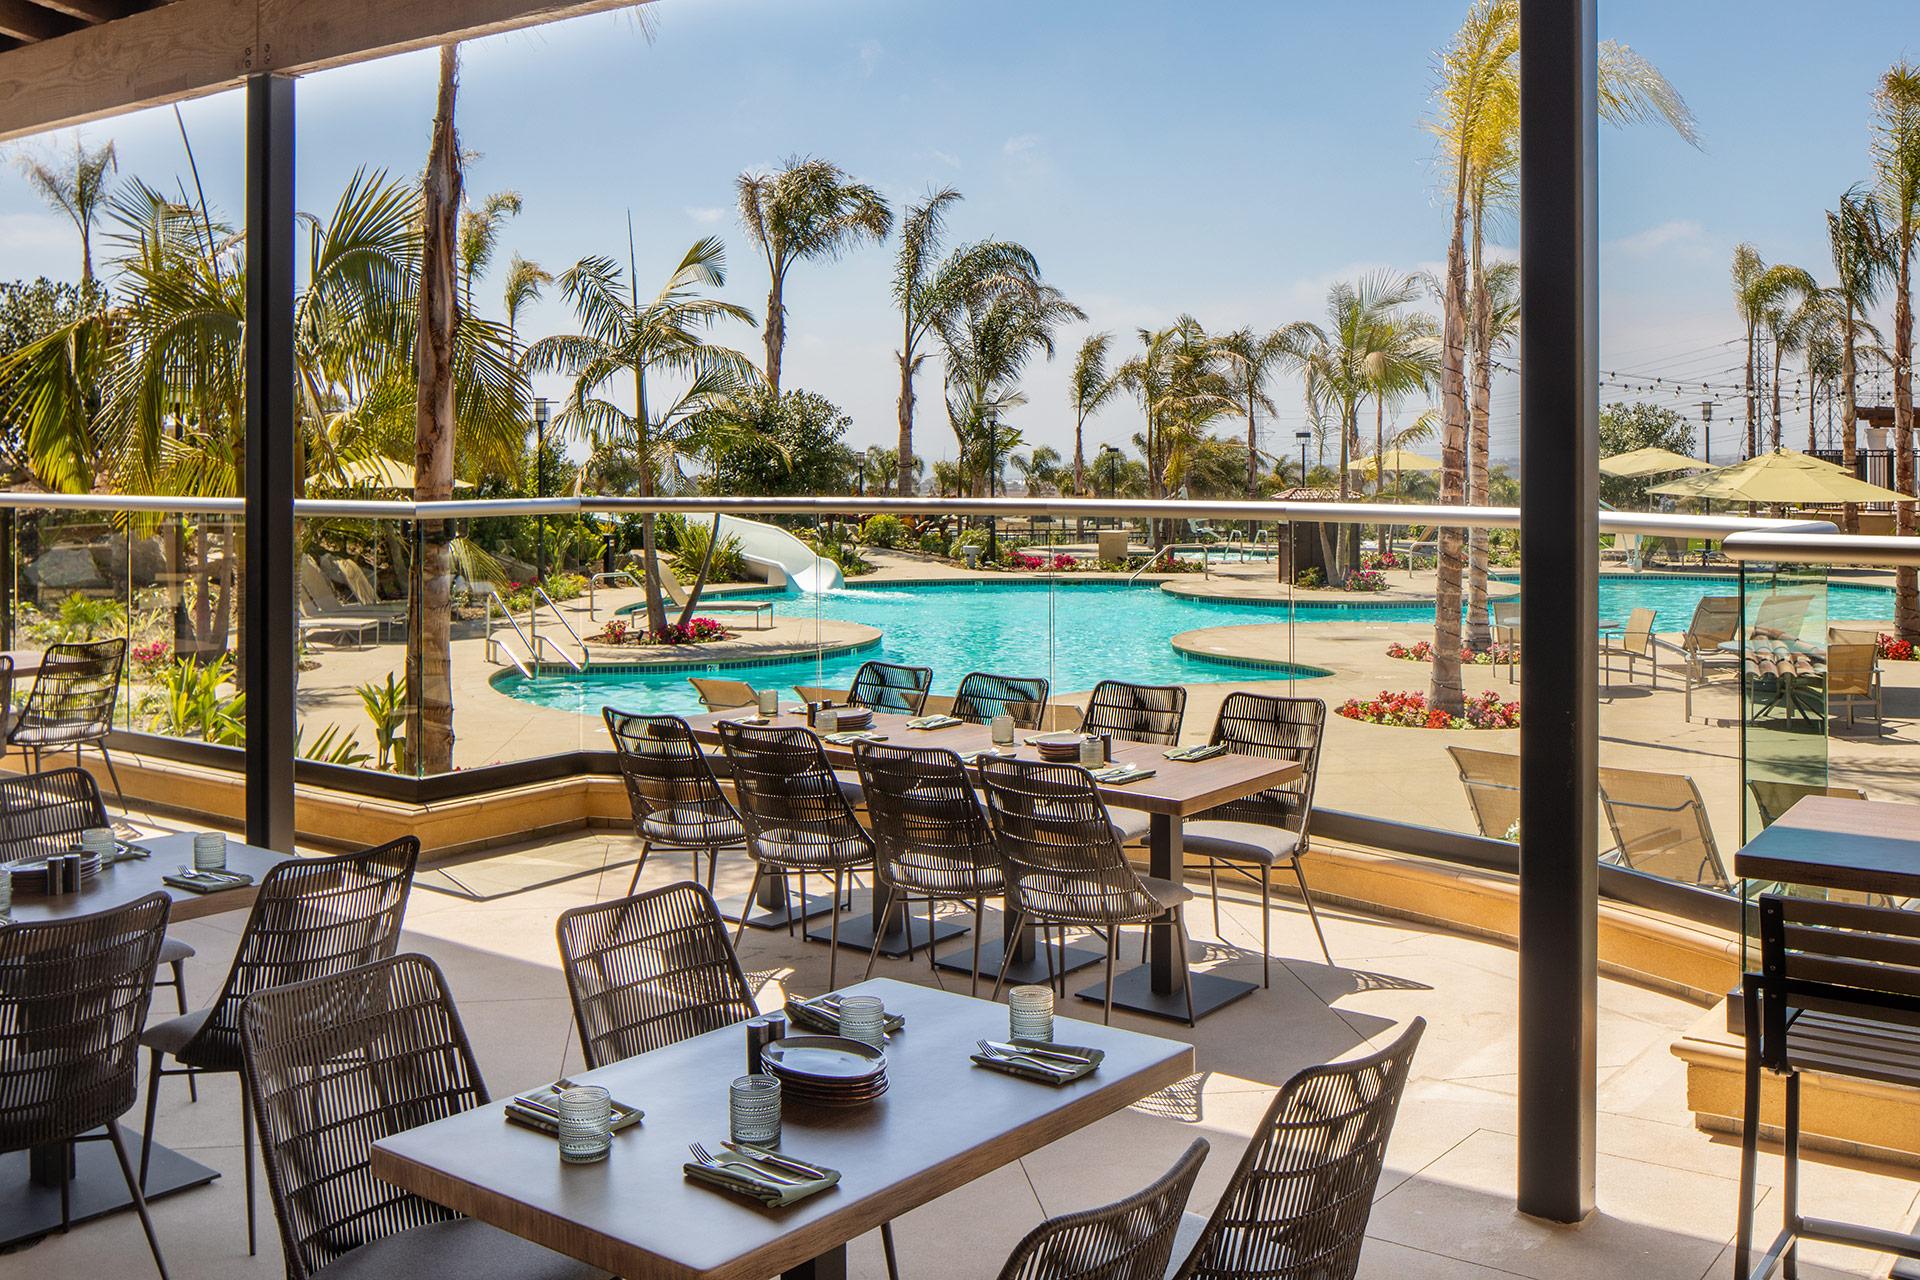 7 Mile Kitchen Patio overlooking pool